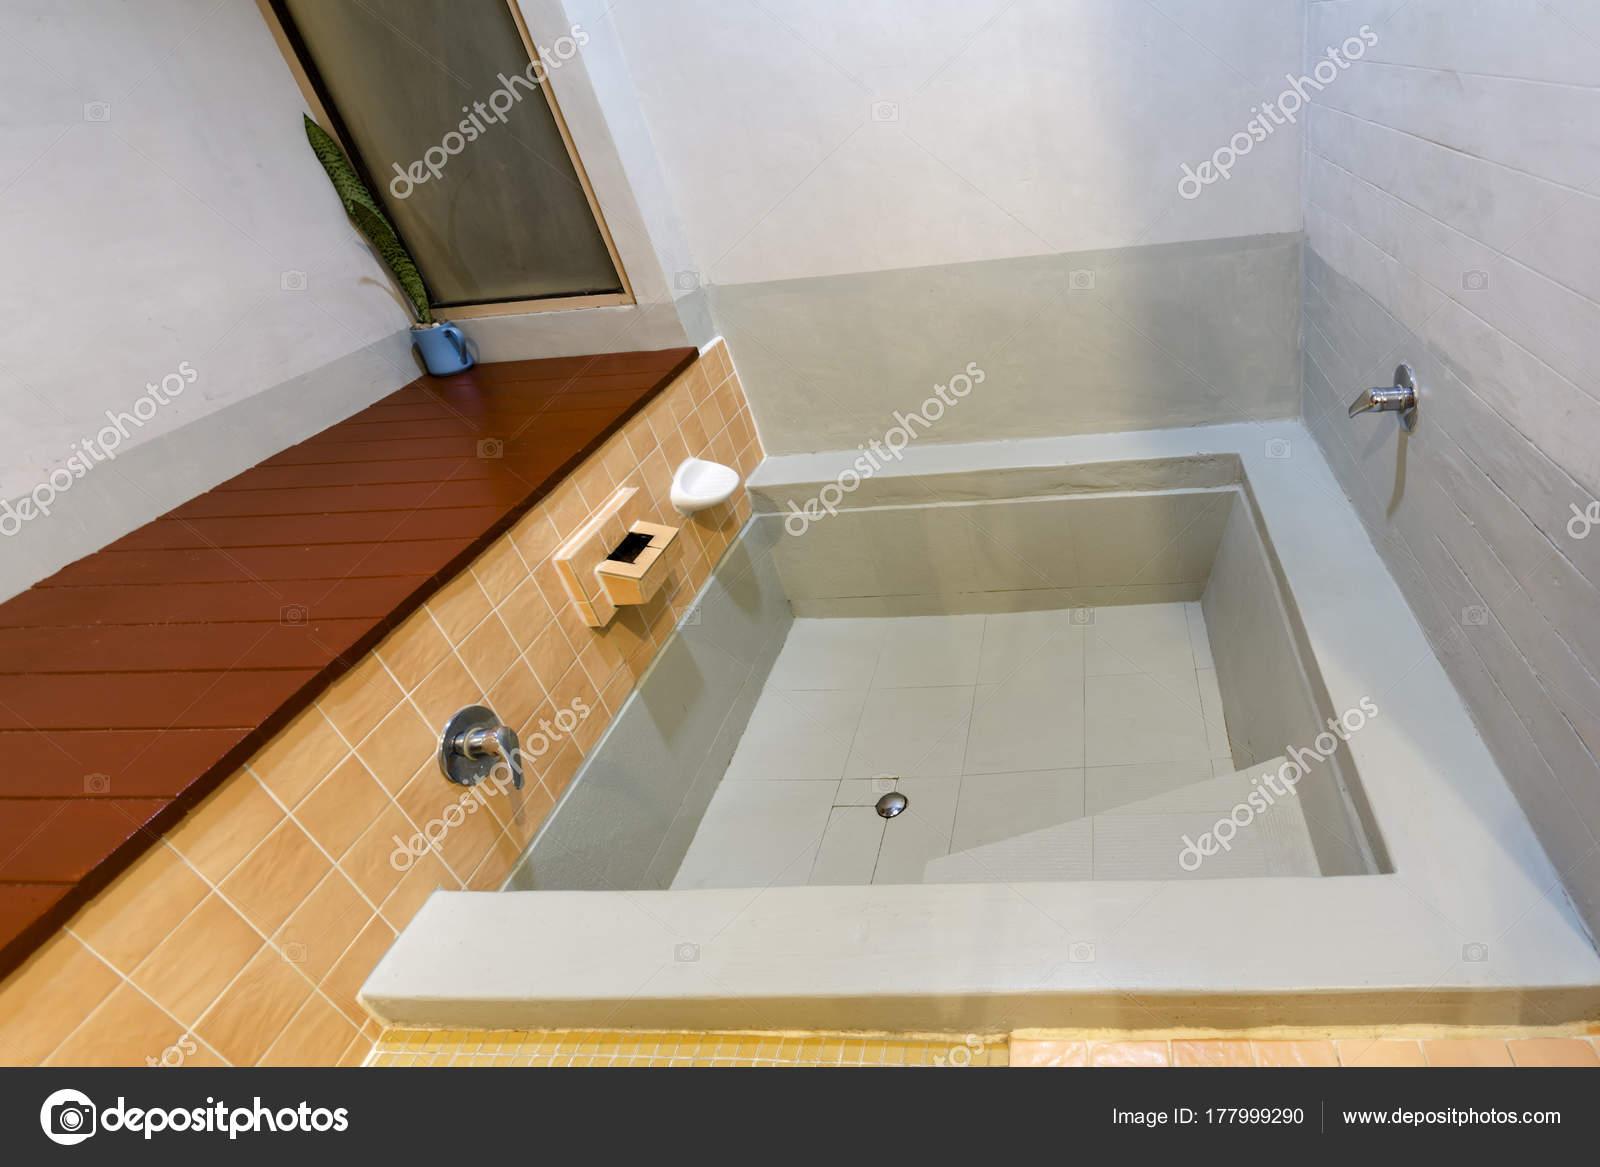 Vasca Da Bagno Kuvet : Turuncu seramik karo döşeme ile banyoda küvet u stok foto